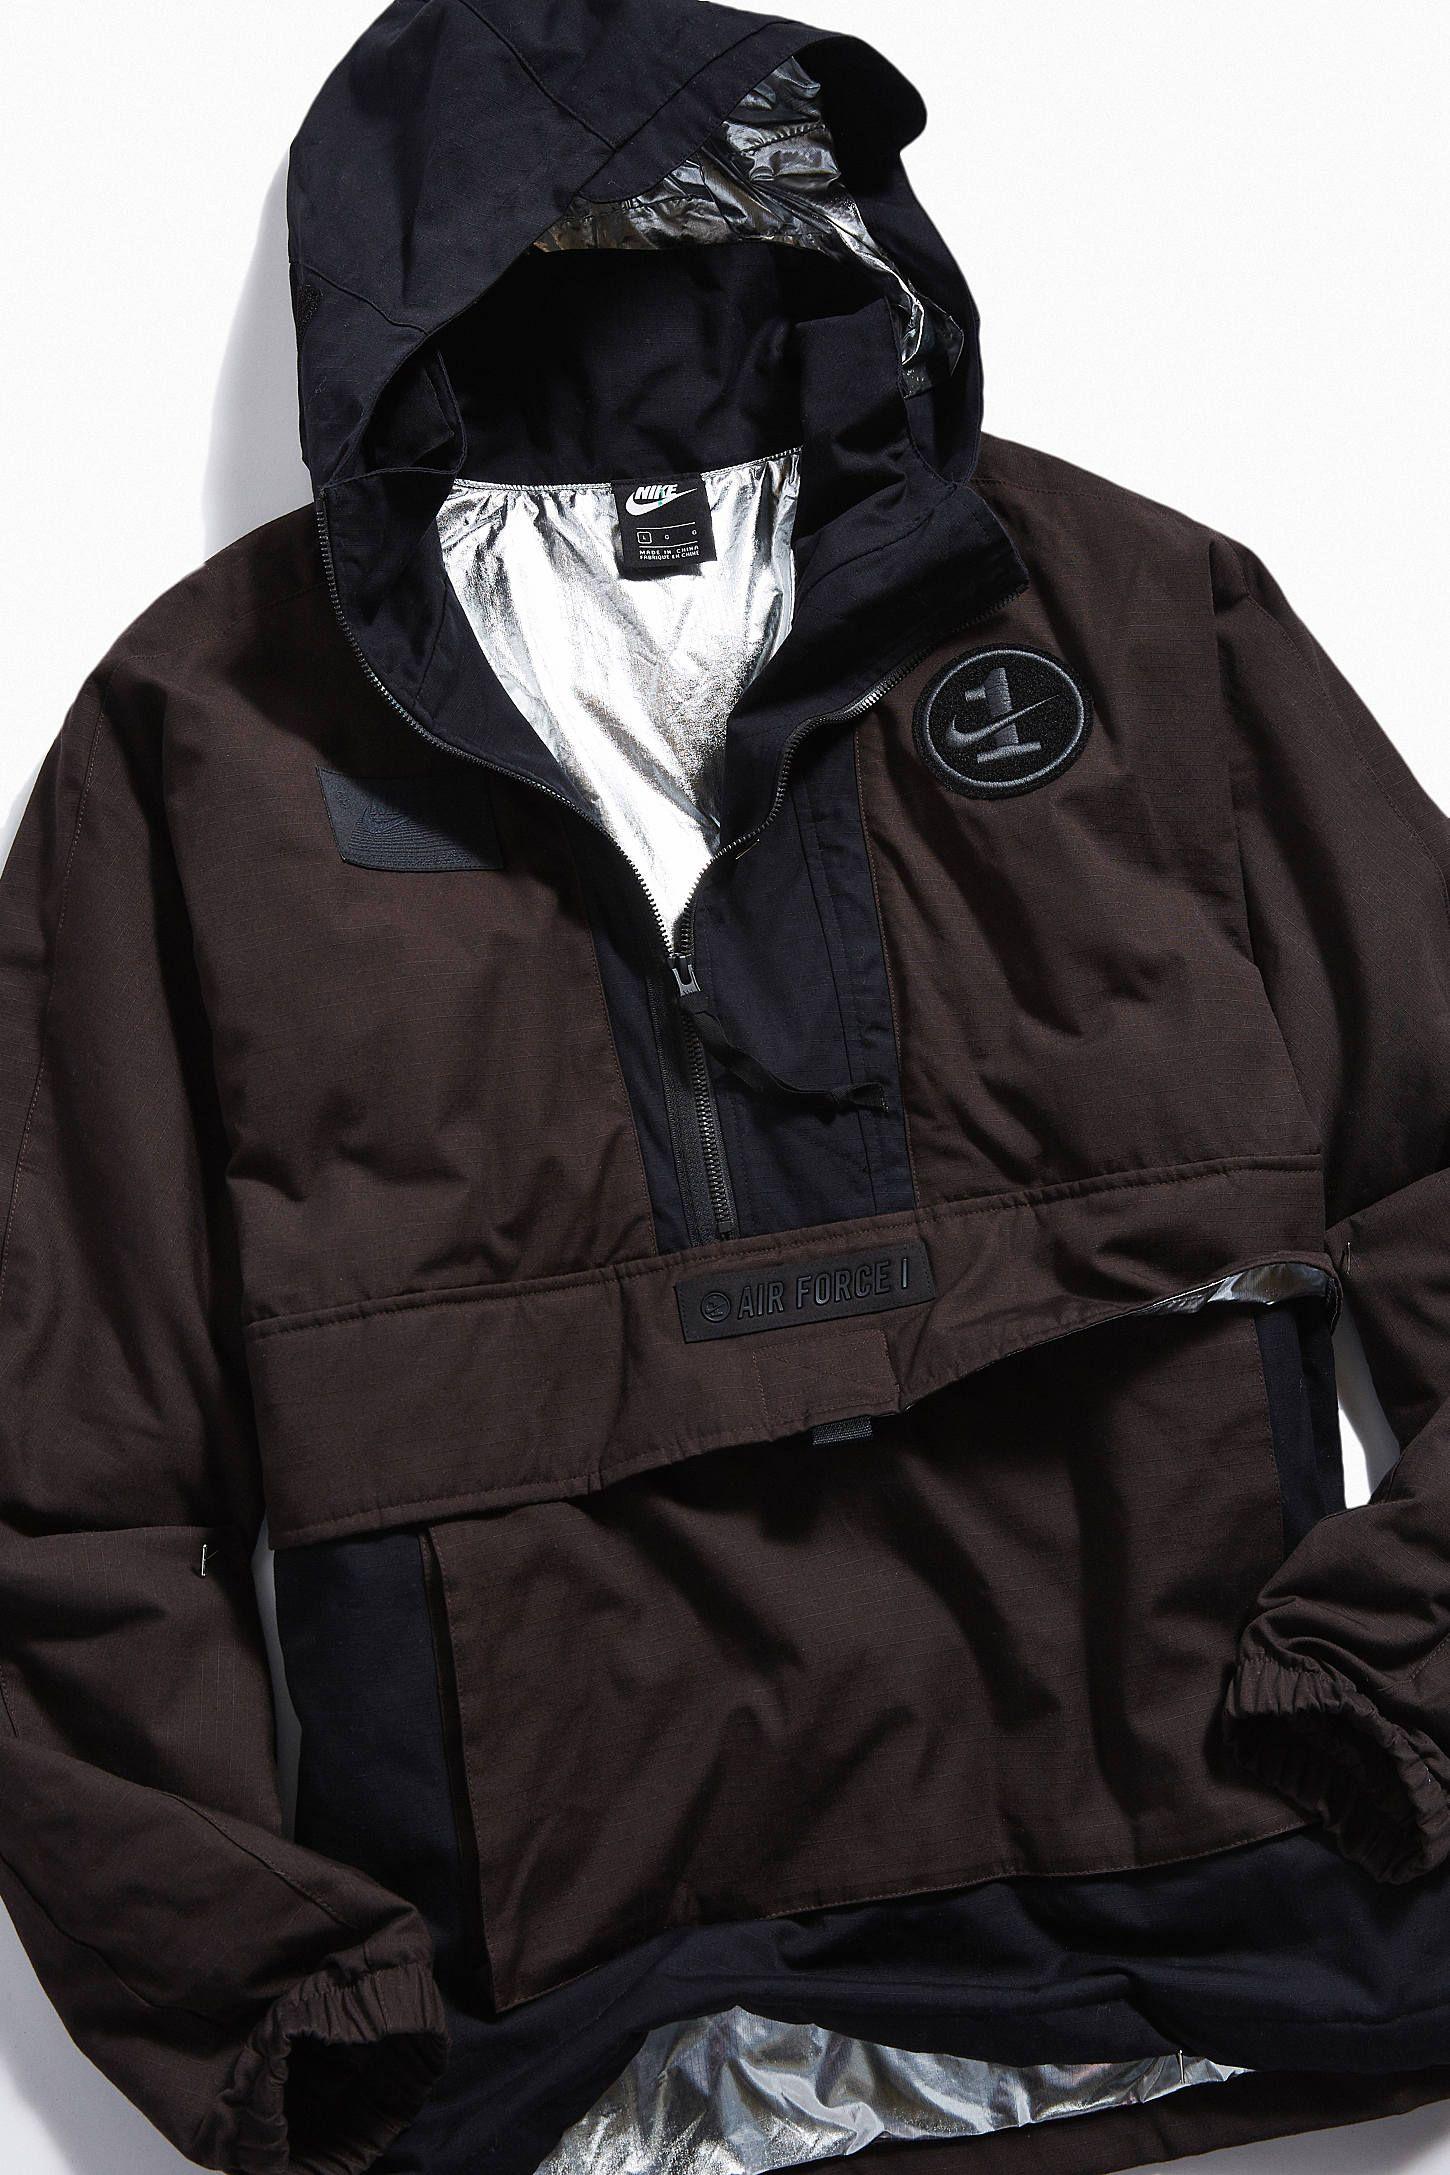 7ecca7f71 Nike Air Force 1 Woven Jacket   luke franz 2018 Christmas list ...